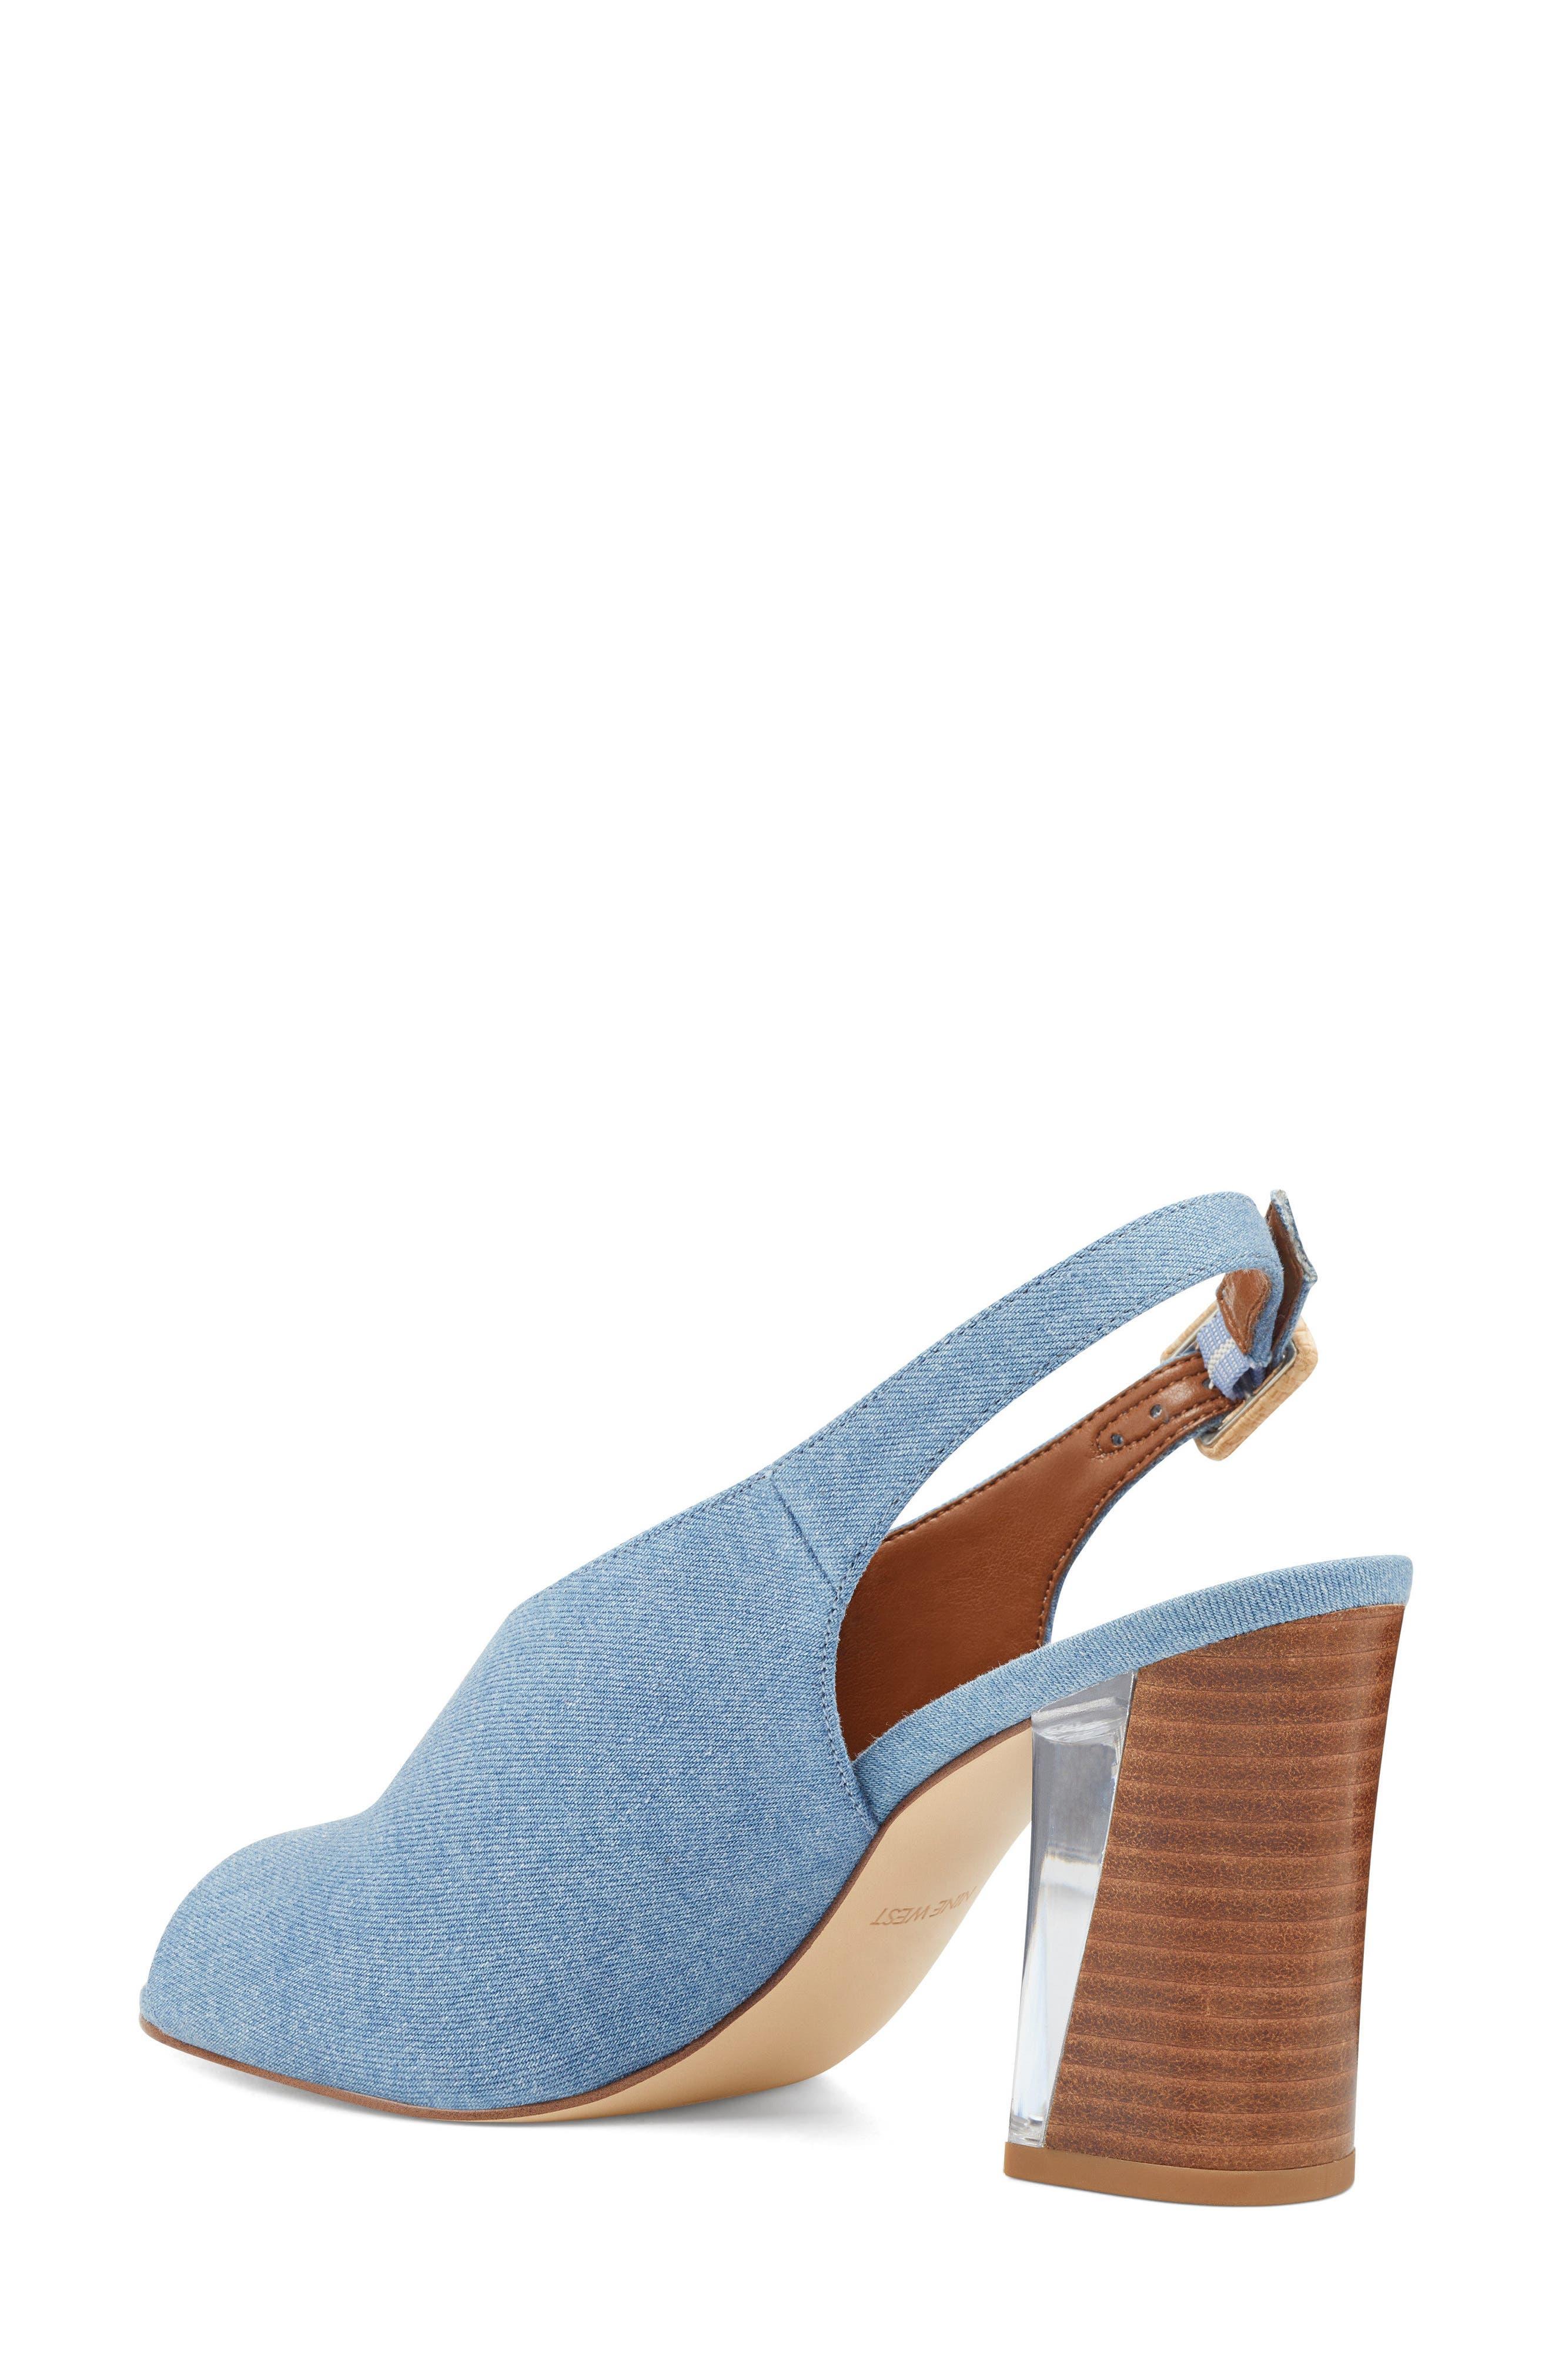 Morenzo Slingback Sandal,                             Alternate thumbnail 2, color,                             Light Blue Fabric